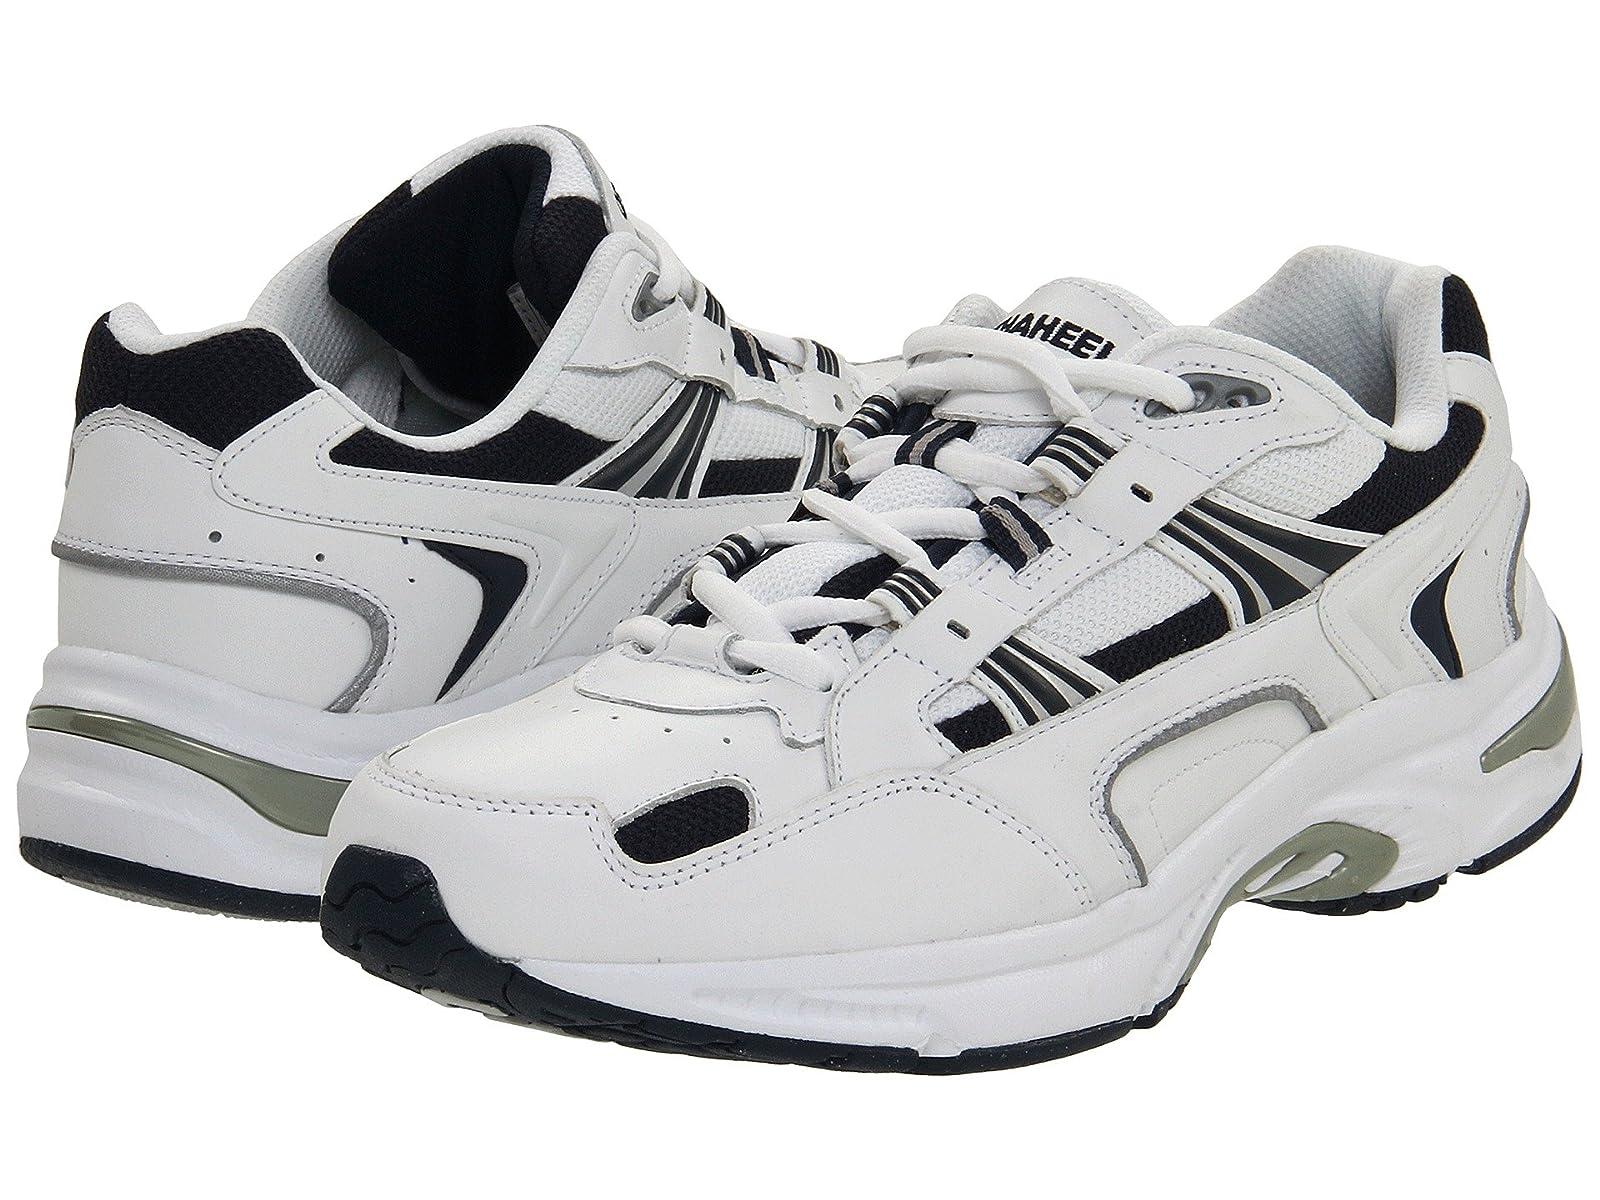 VIONIC WalkerAtmospheric grades have affordable shoes